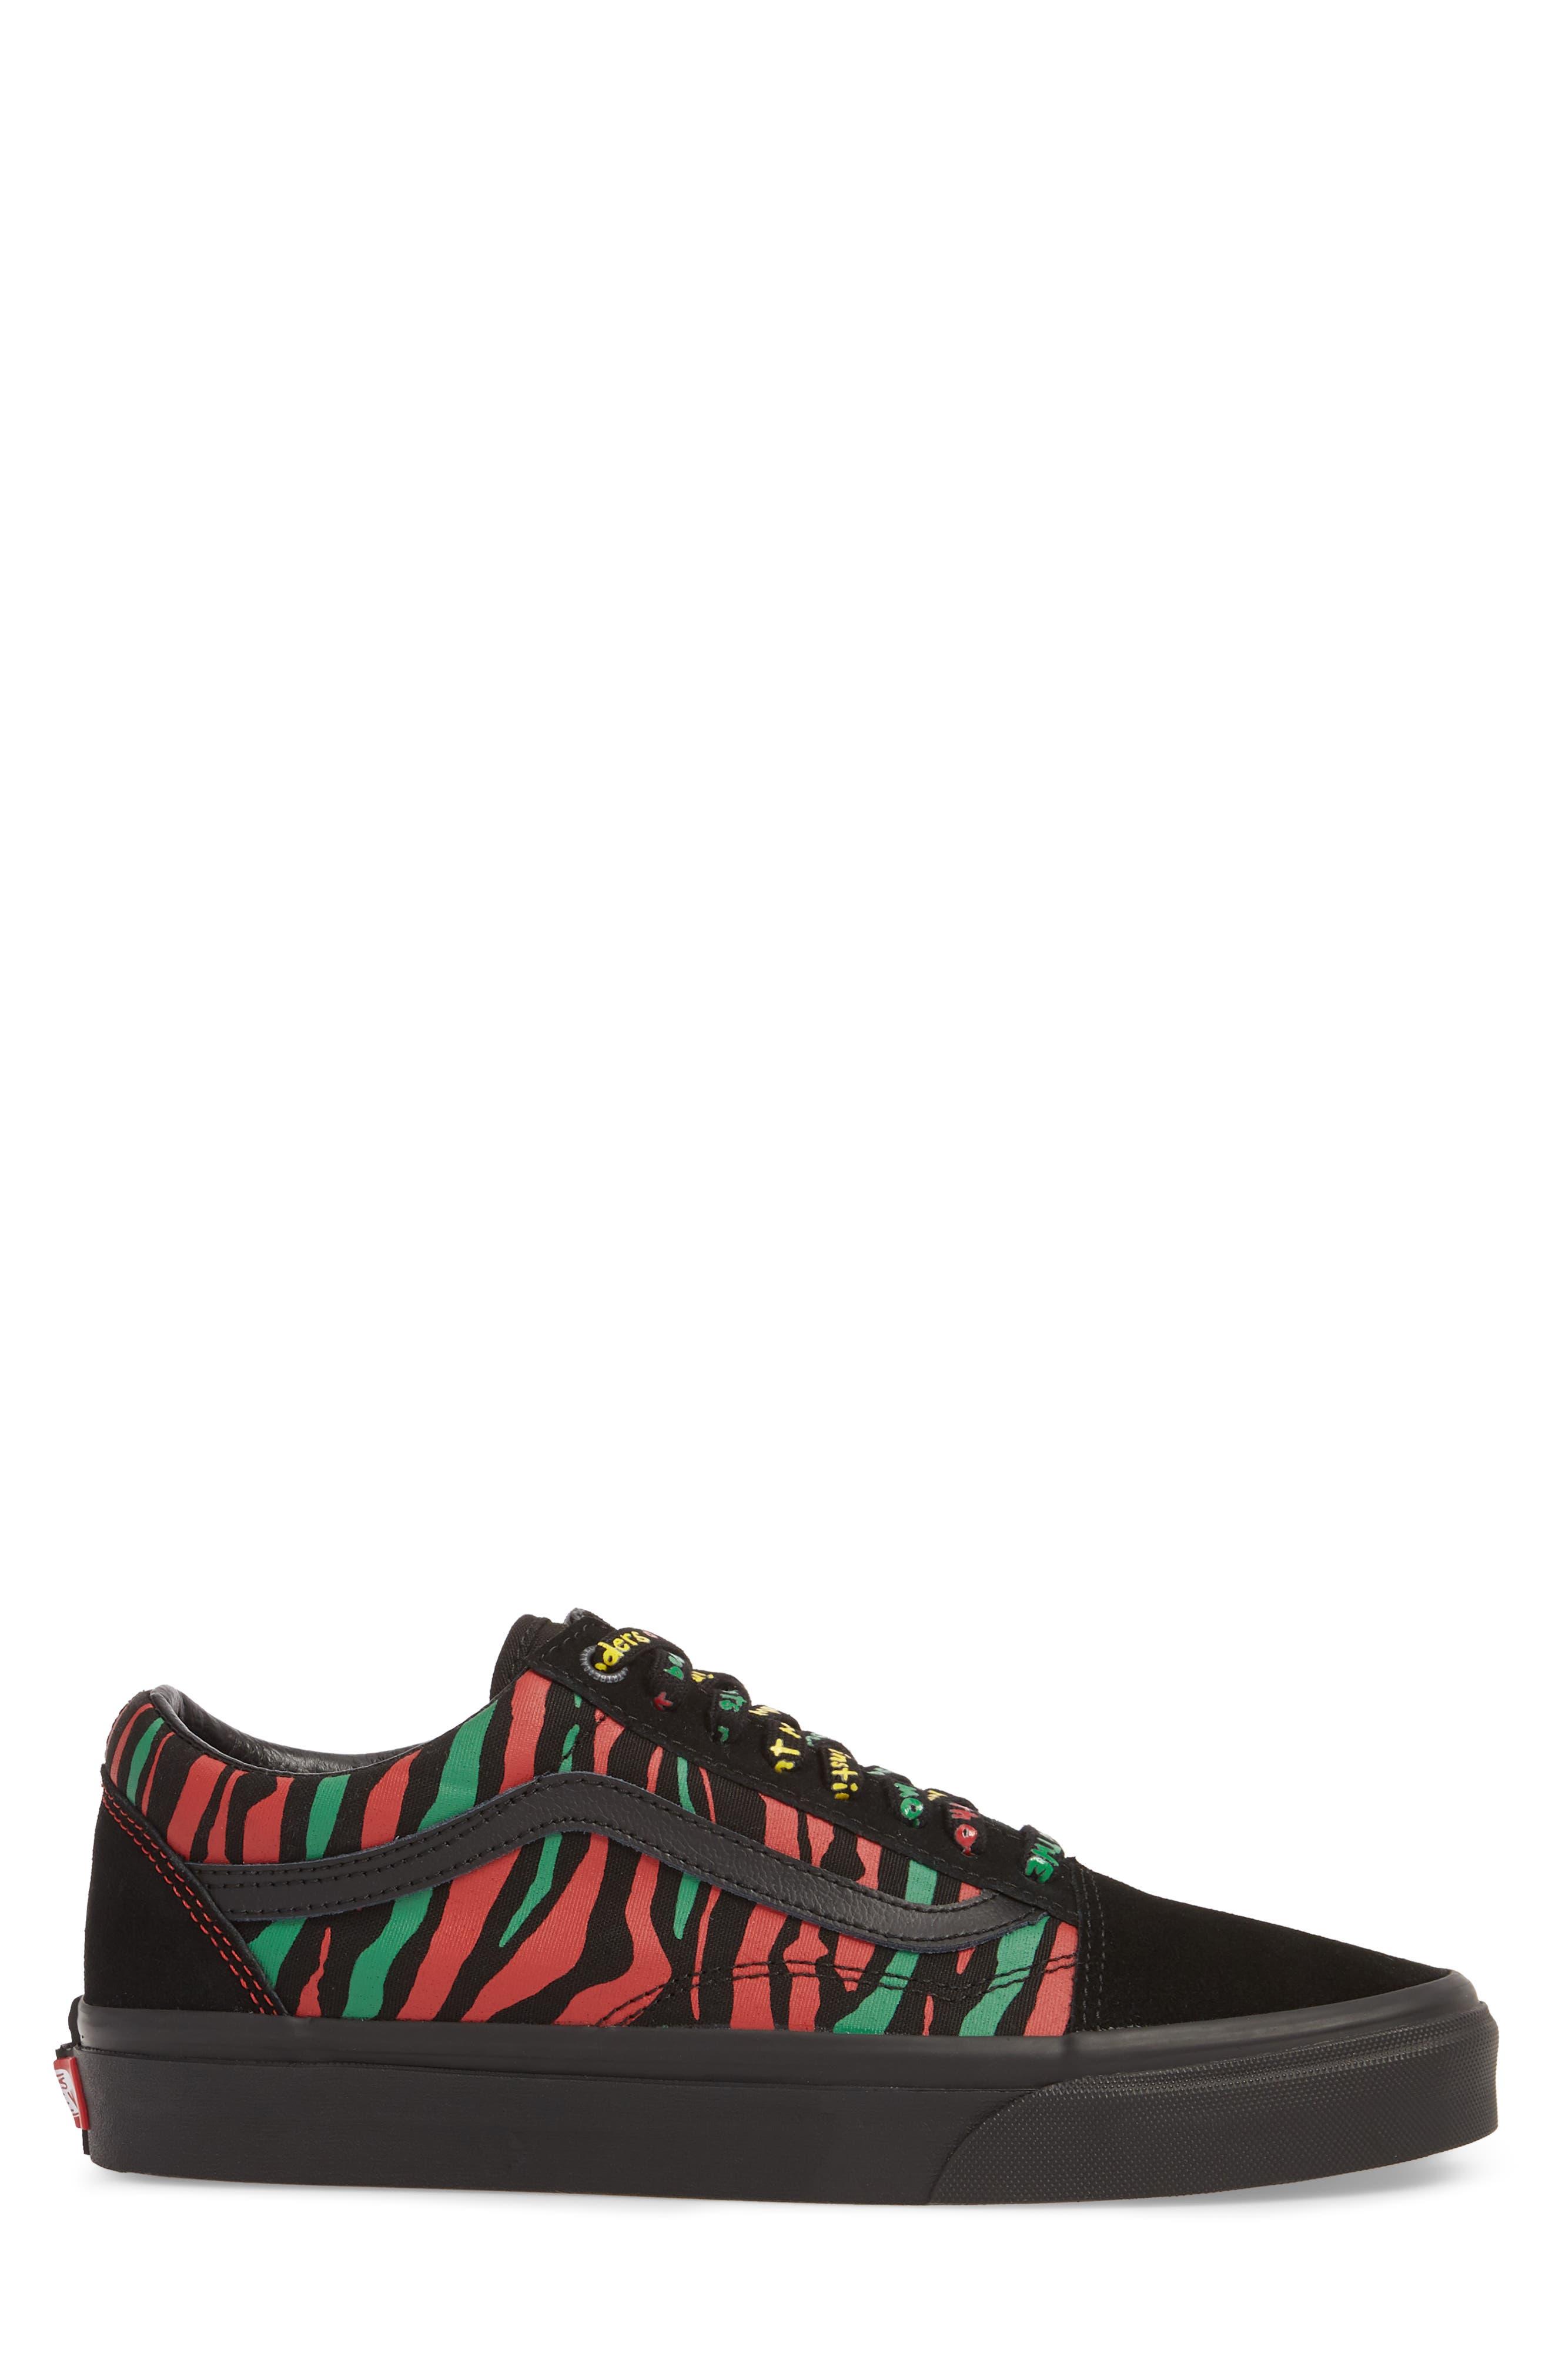 ATCQ Old Skool Sneaker,                             Alternate thumbnail 3, color,